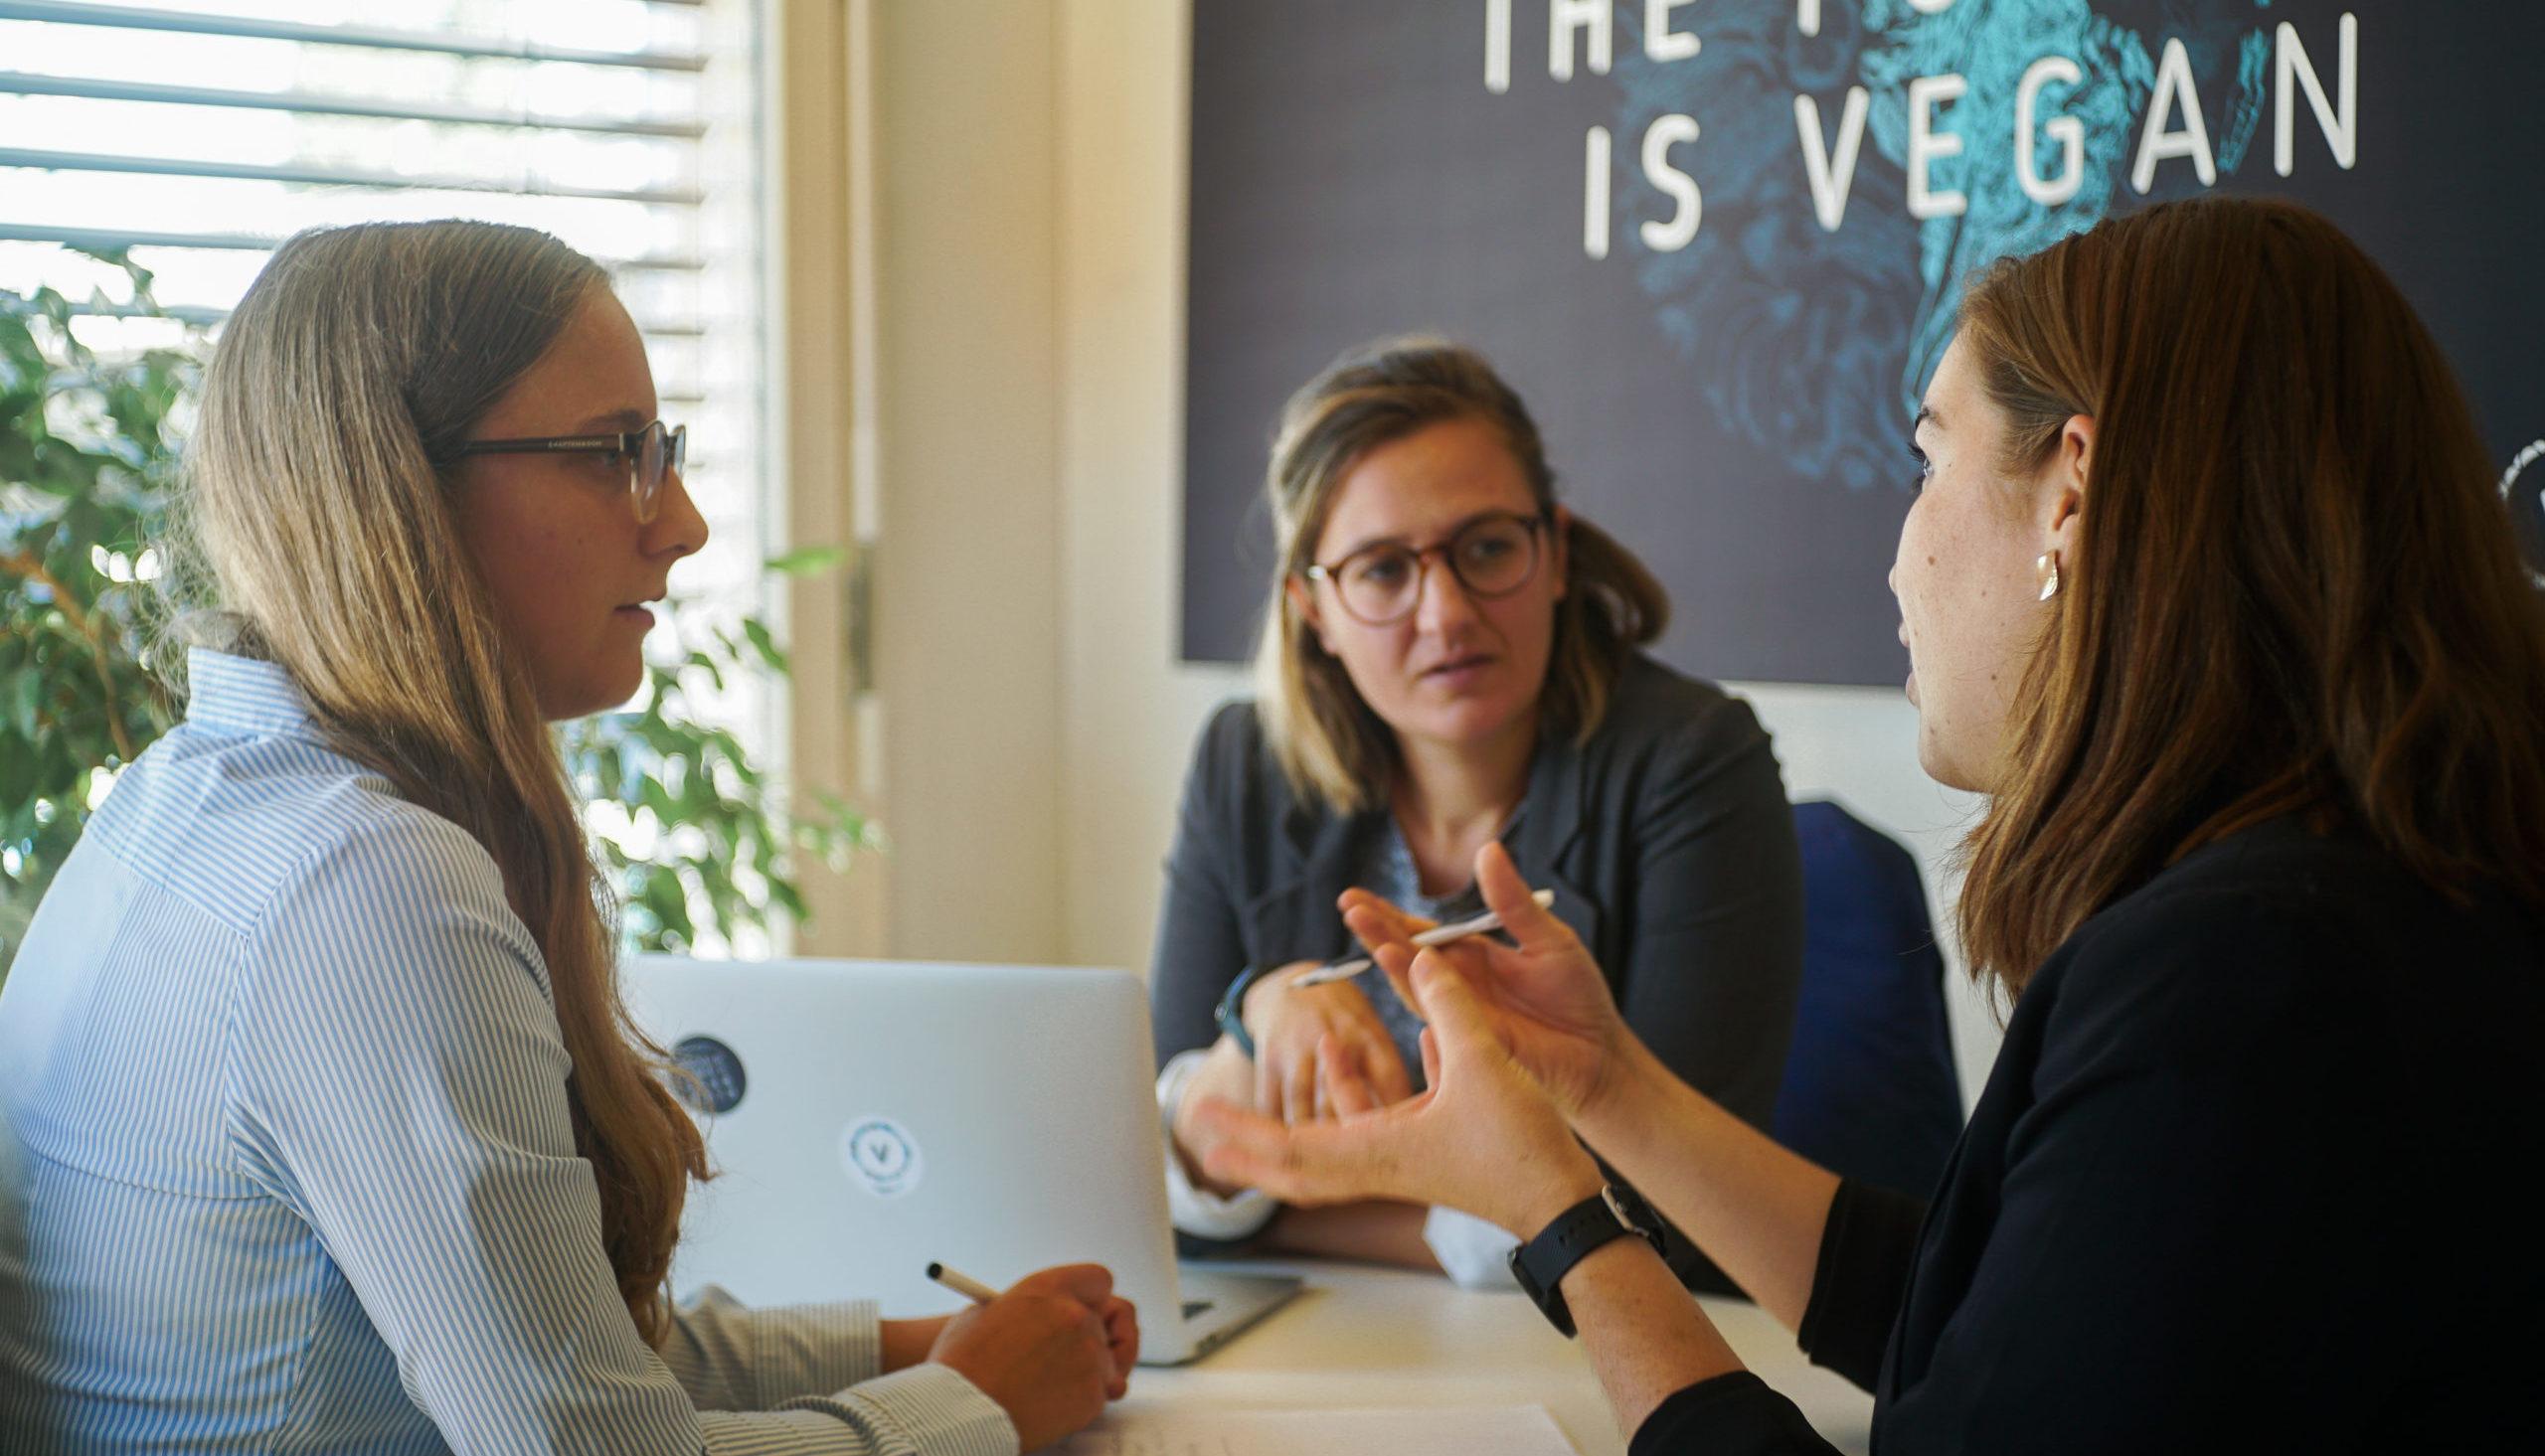 Business Vegan.ch